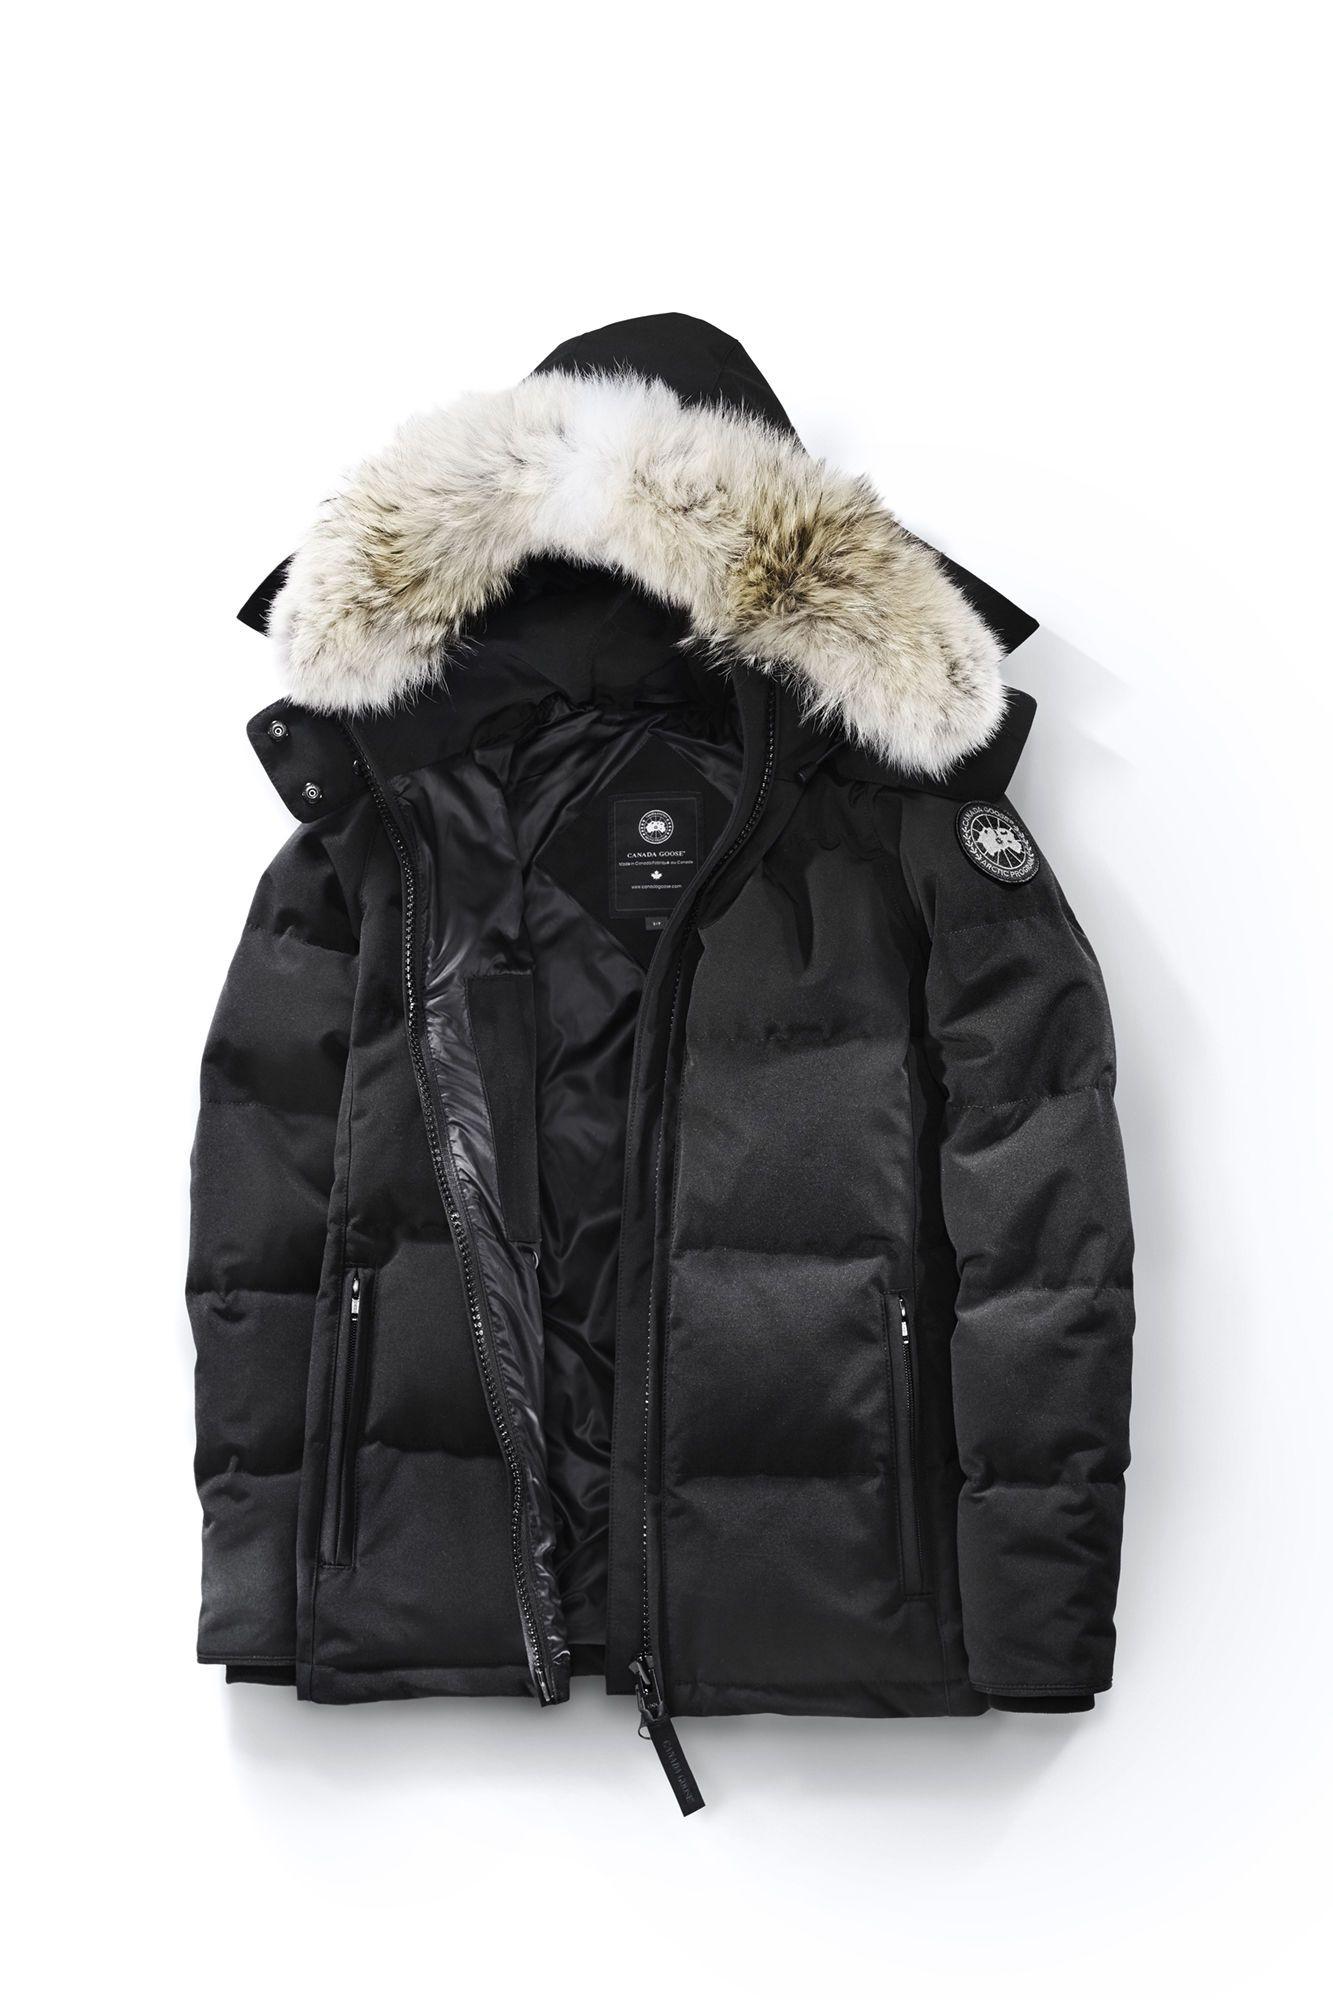 980291927851 Canada Goose Chelsea Parka Black Label  800